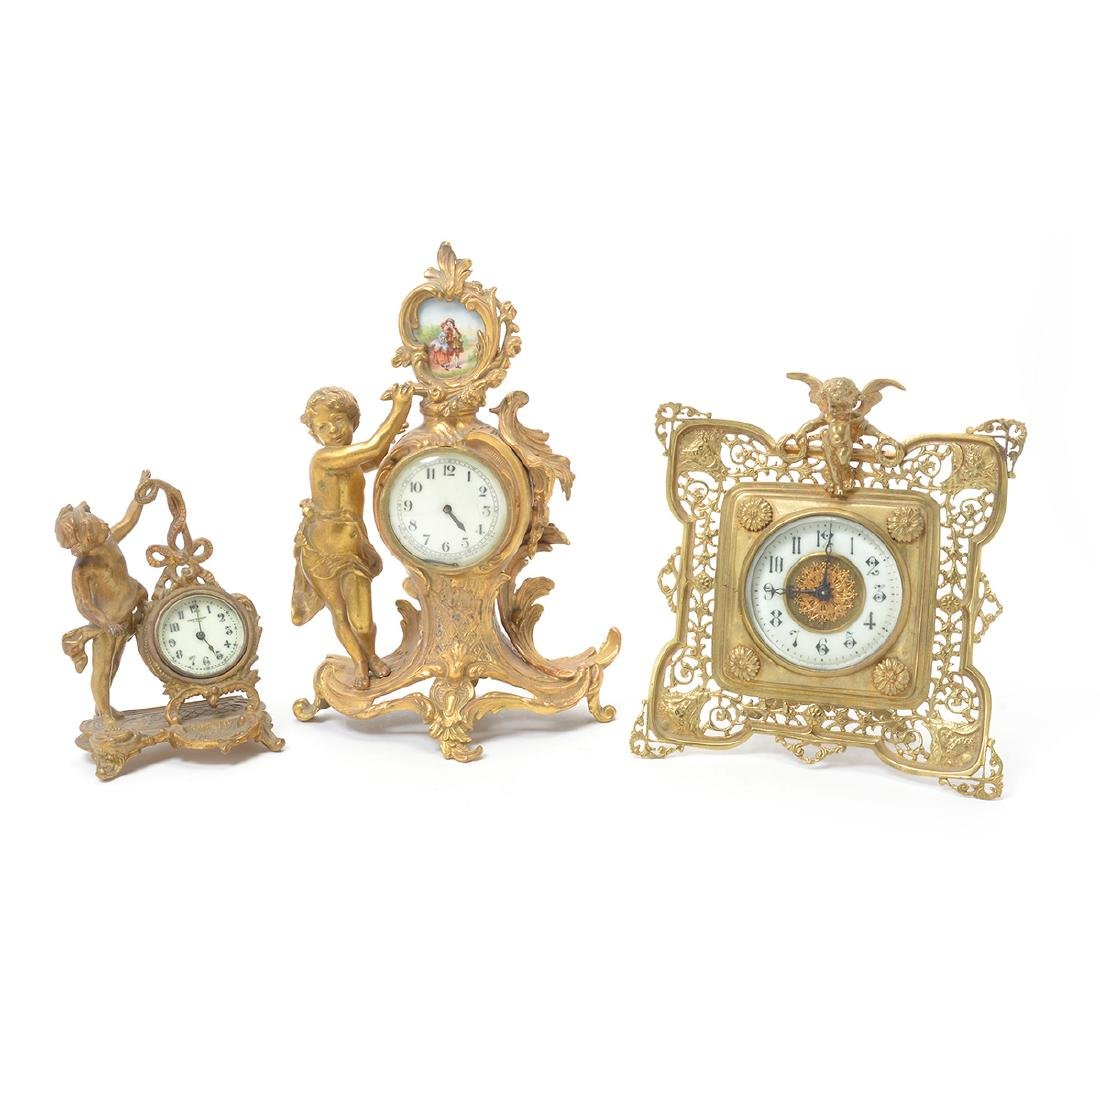 Three Louis XV Style Figural Clocks